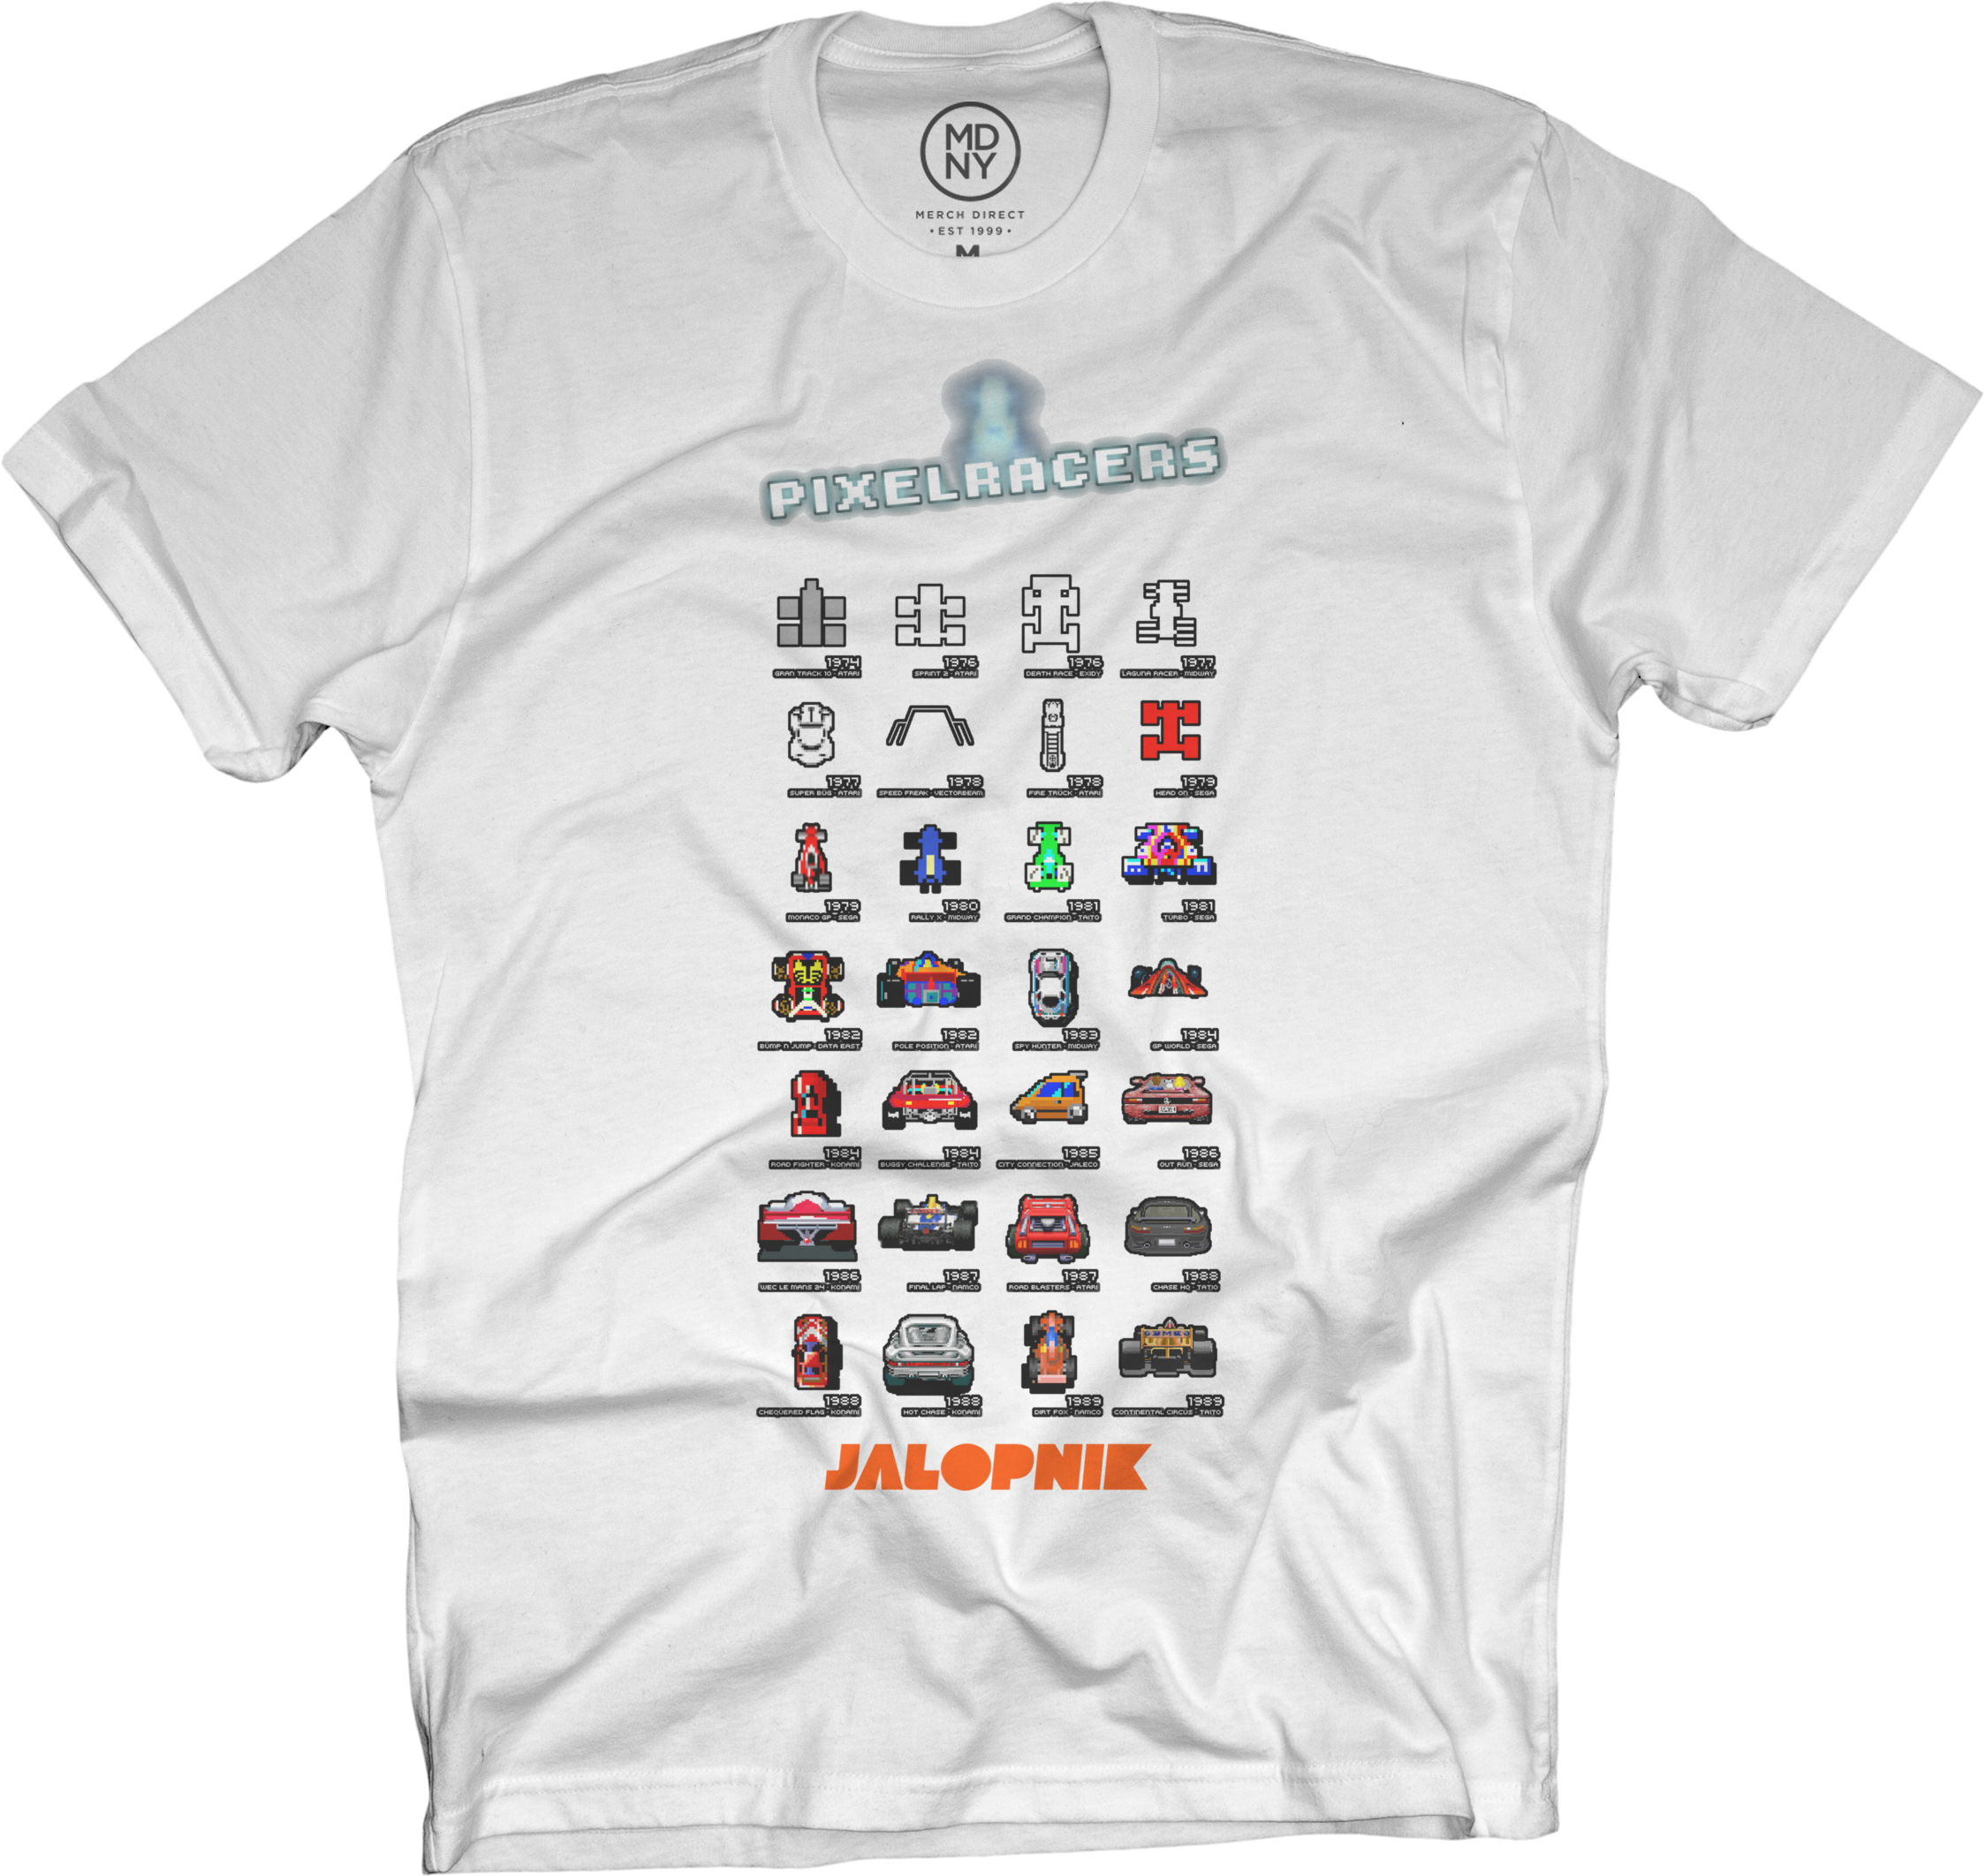 8-Bit Racers White T-Shirt